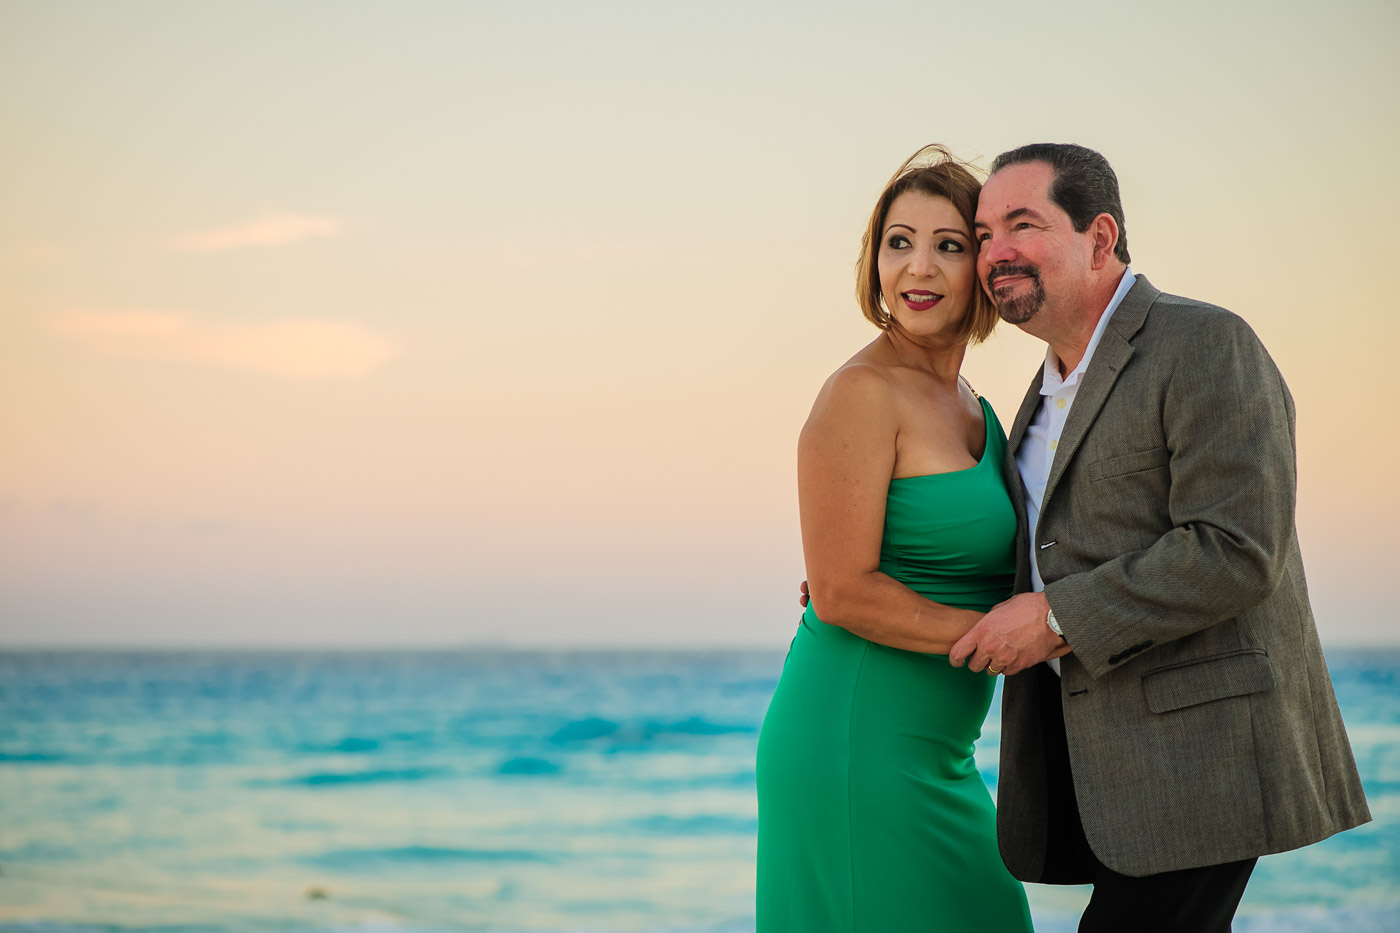 Sunset Hotel Anniversary Photos